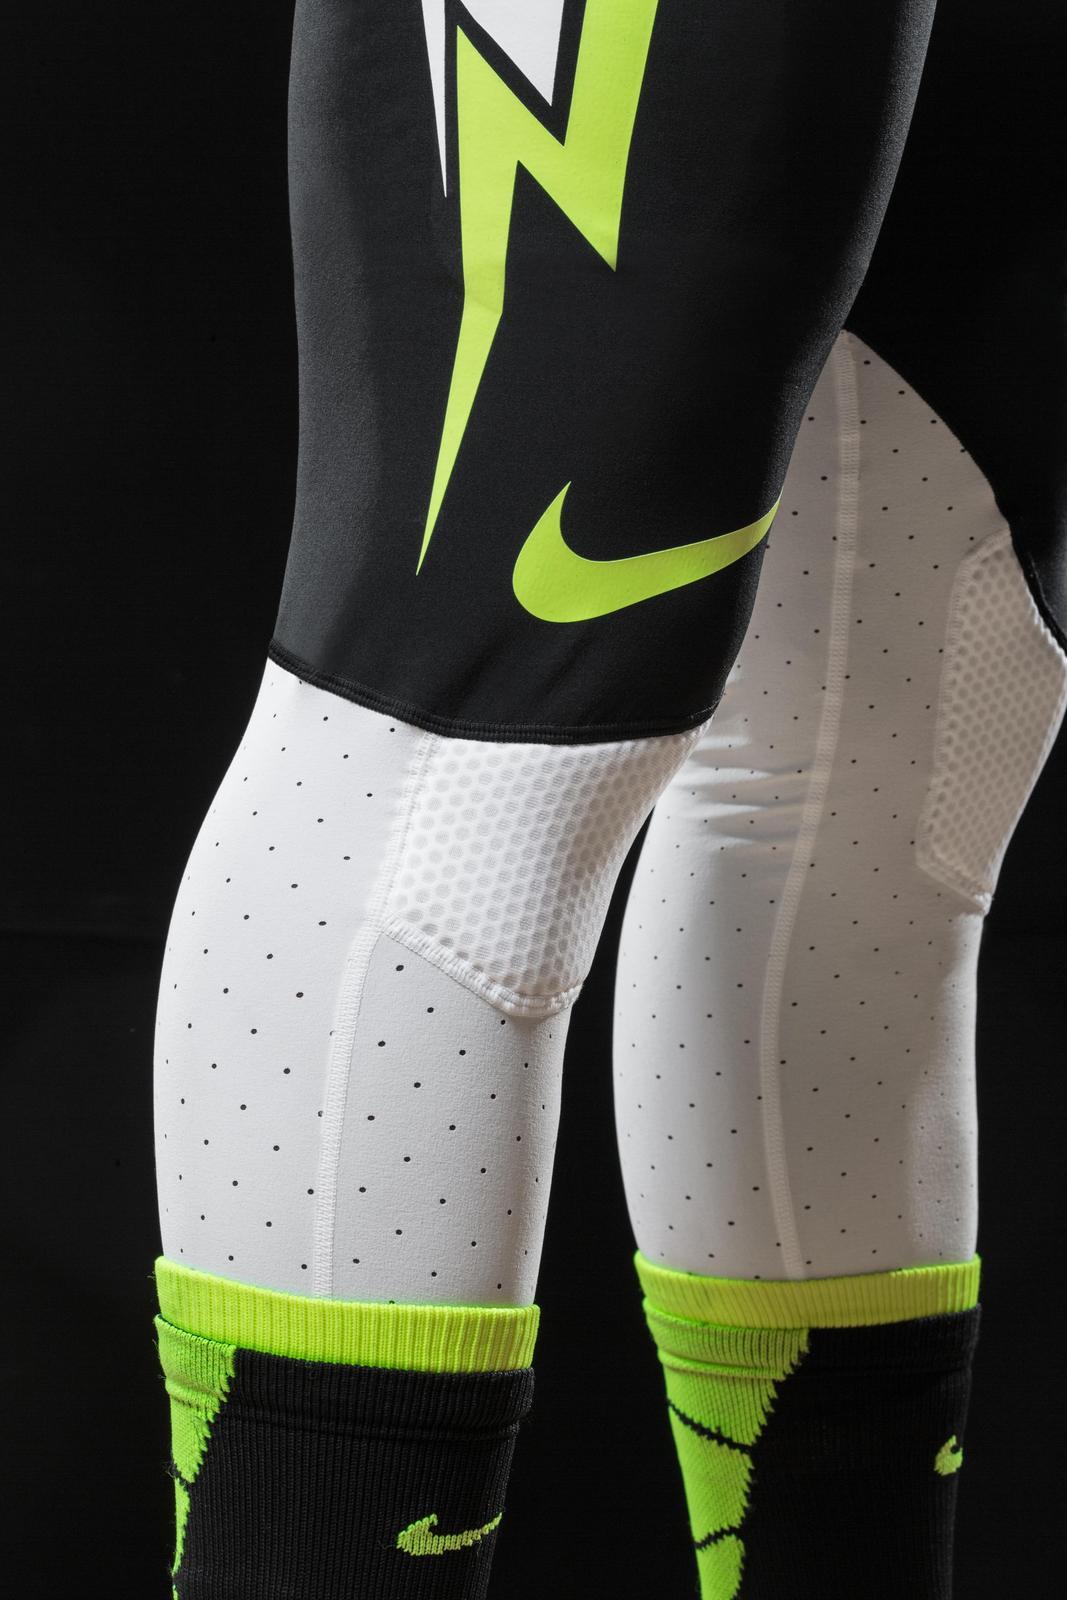 Nike Vapor Speed Football Uniform Unveiled Nike News